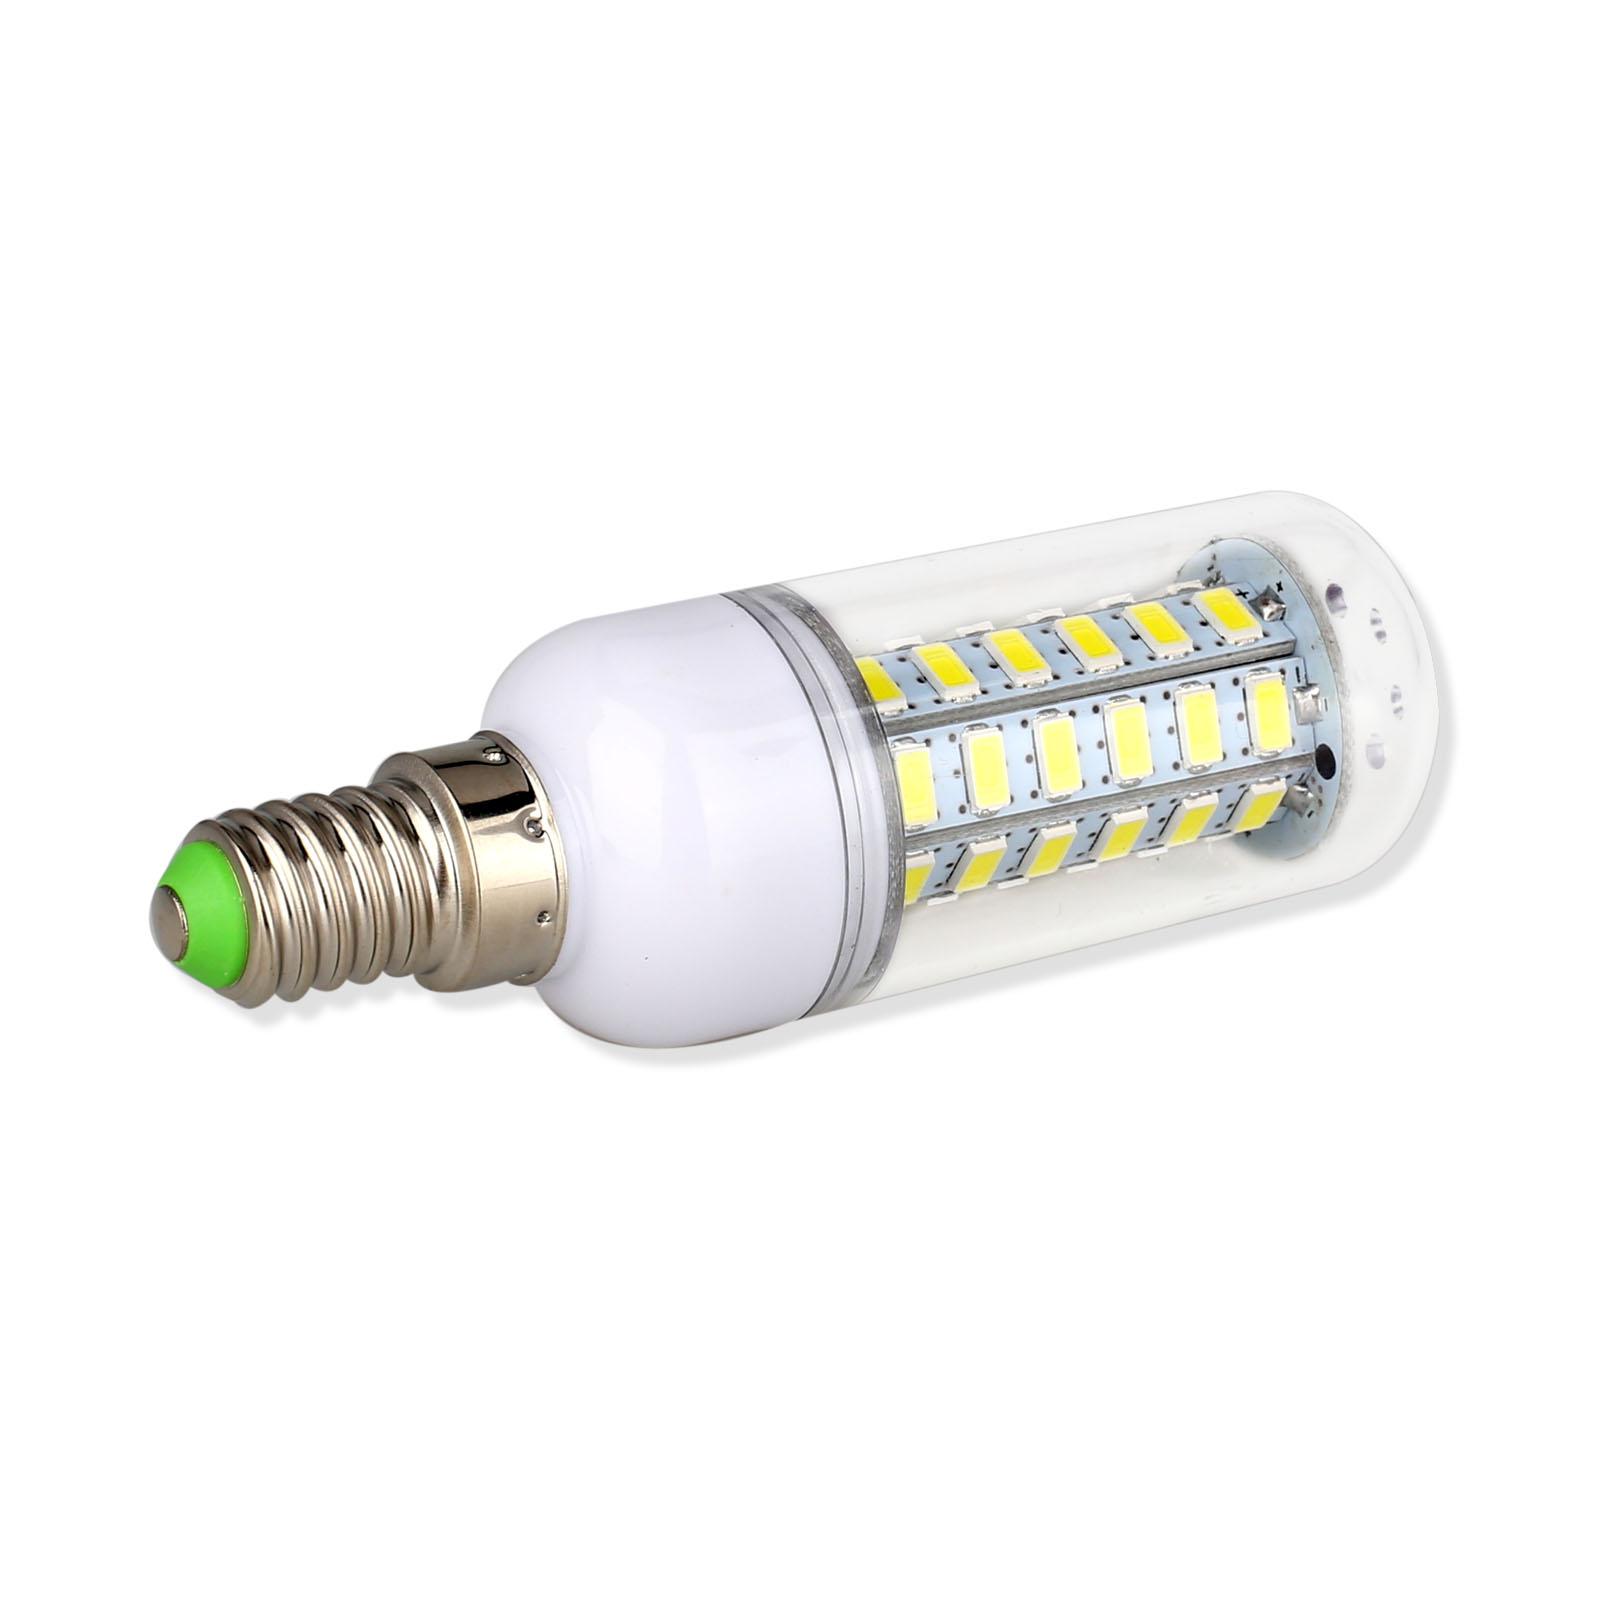 LED Birnen Glühbirne E27 E14 Warmweiß Kaltweiß Neutralweiß 5730 SMD 220V Lampe